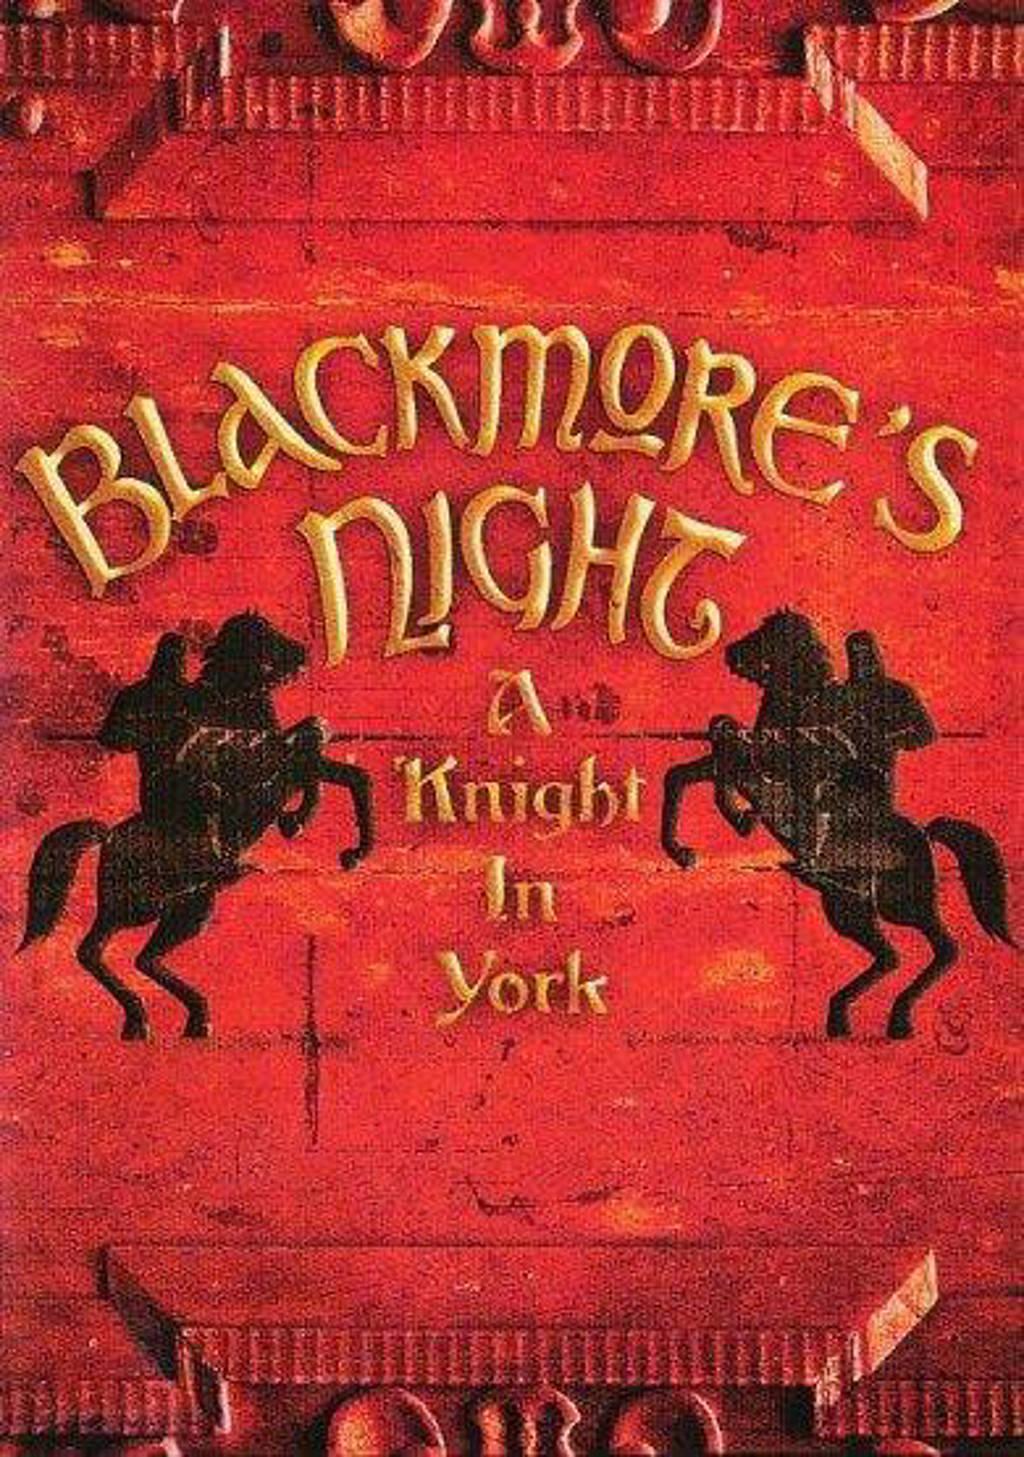 Blackmores Night - A Knight In York (DVD)